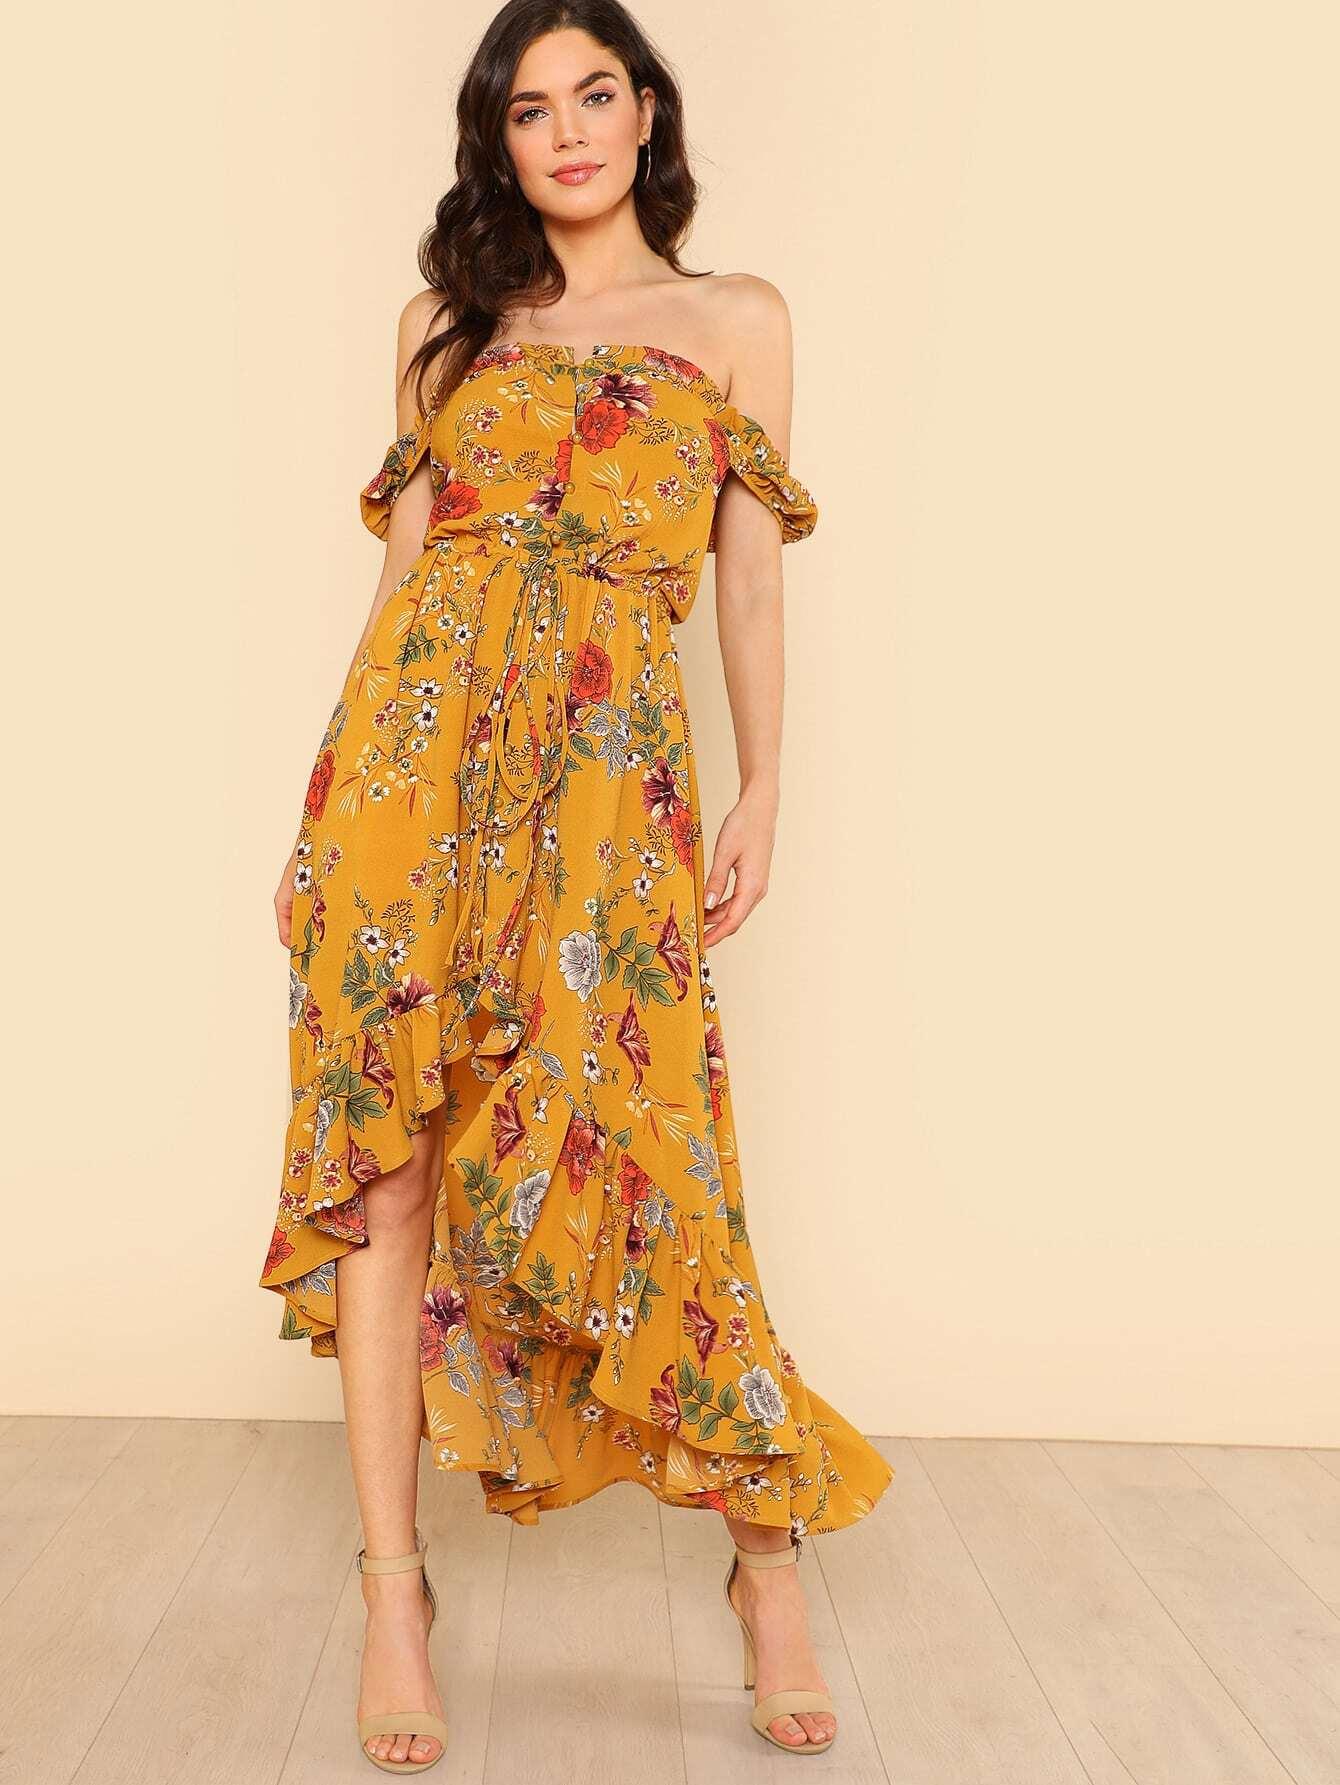 Drawstring Waist Asymmetrical Ruffle Hem Floral Bardot Dress knot side floral asymmetrical ruffle hem dress